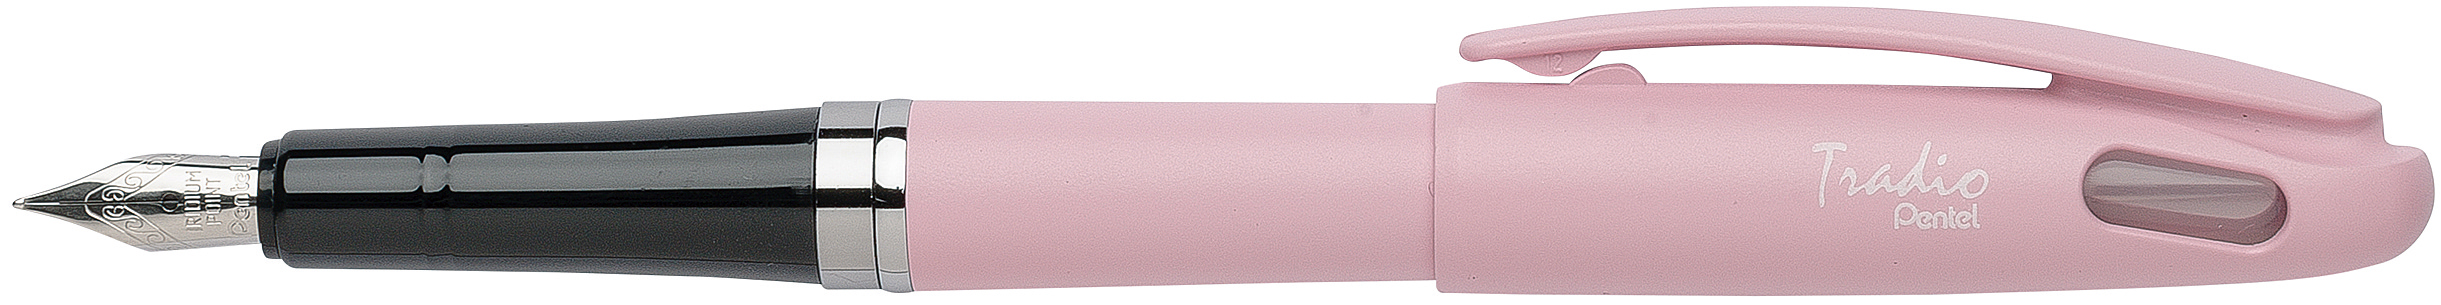 Pentel Tradio Pastel - Stylo plume - corps rose